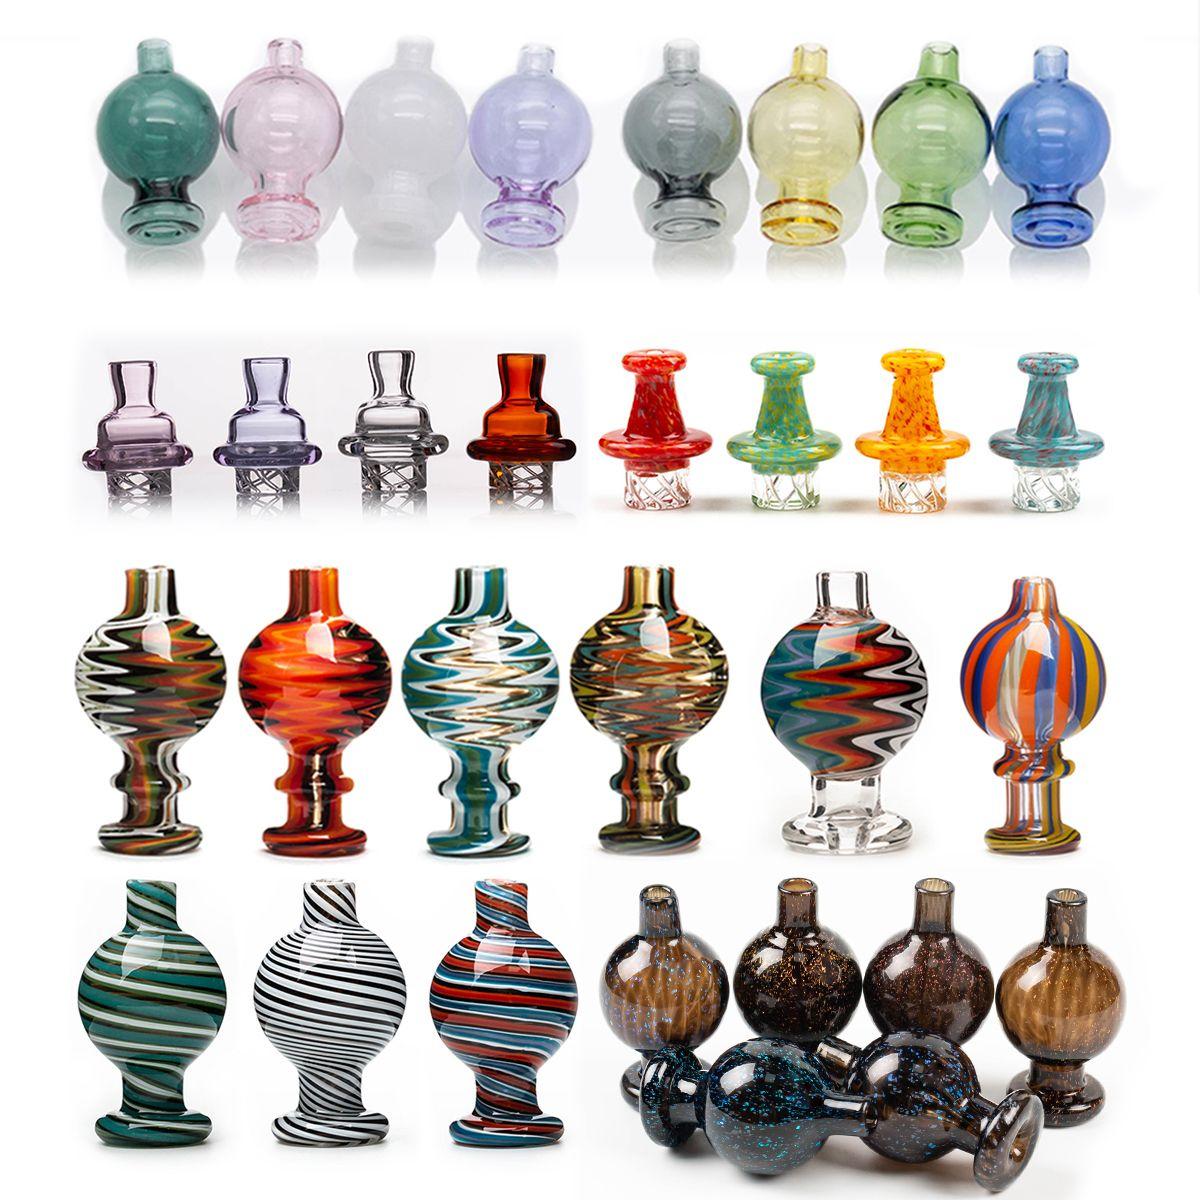 8 Art Bubble Ball Glas Carb-Kappe US Spinning-Carb-Kappe für OD 25mm Quarz-Banger Nail Dab Rig